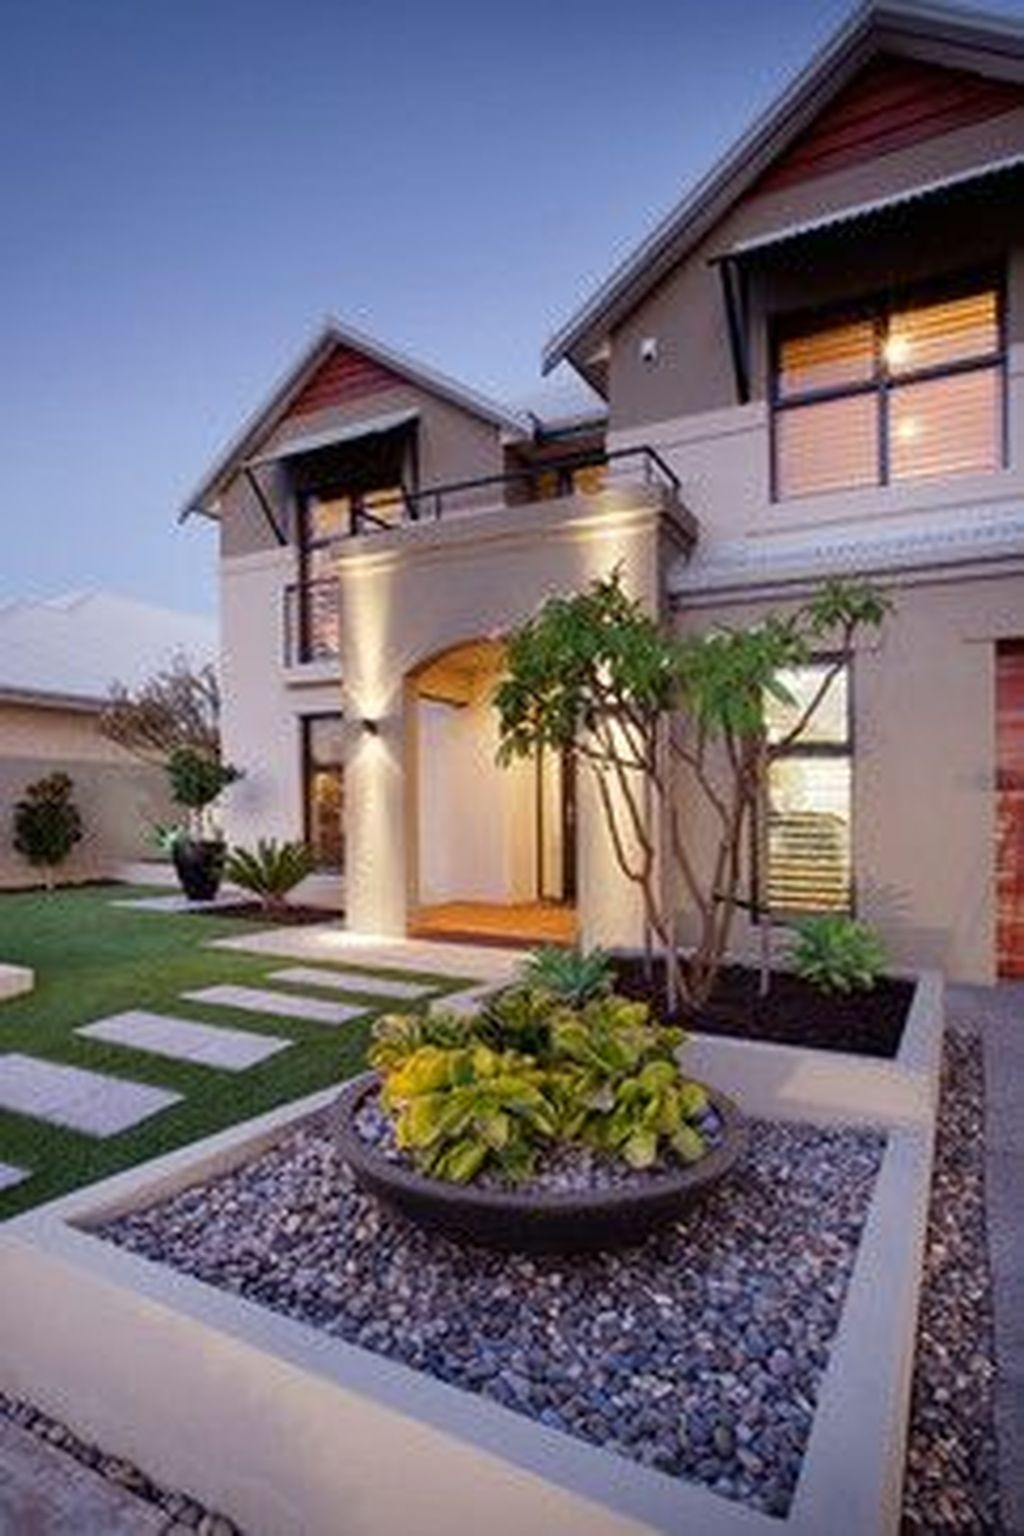 totally beautiful front yard landscaping ideas on a budget 11  u2013 homedecorish